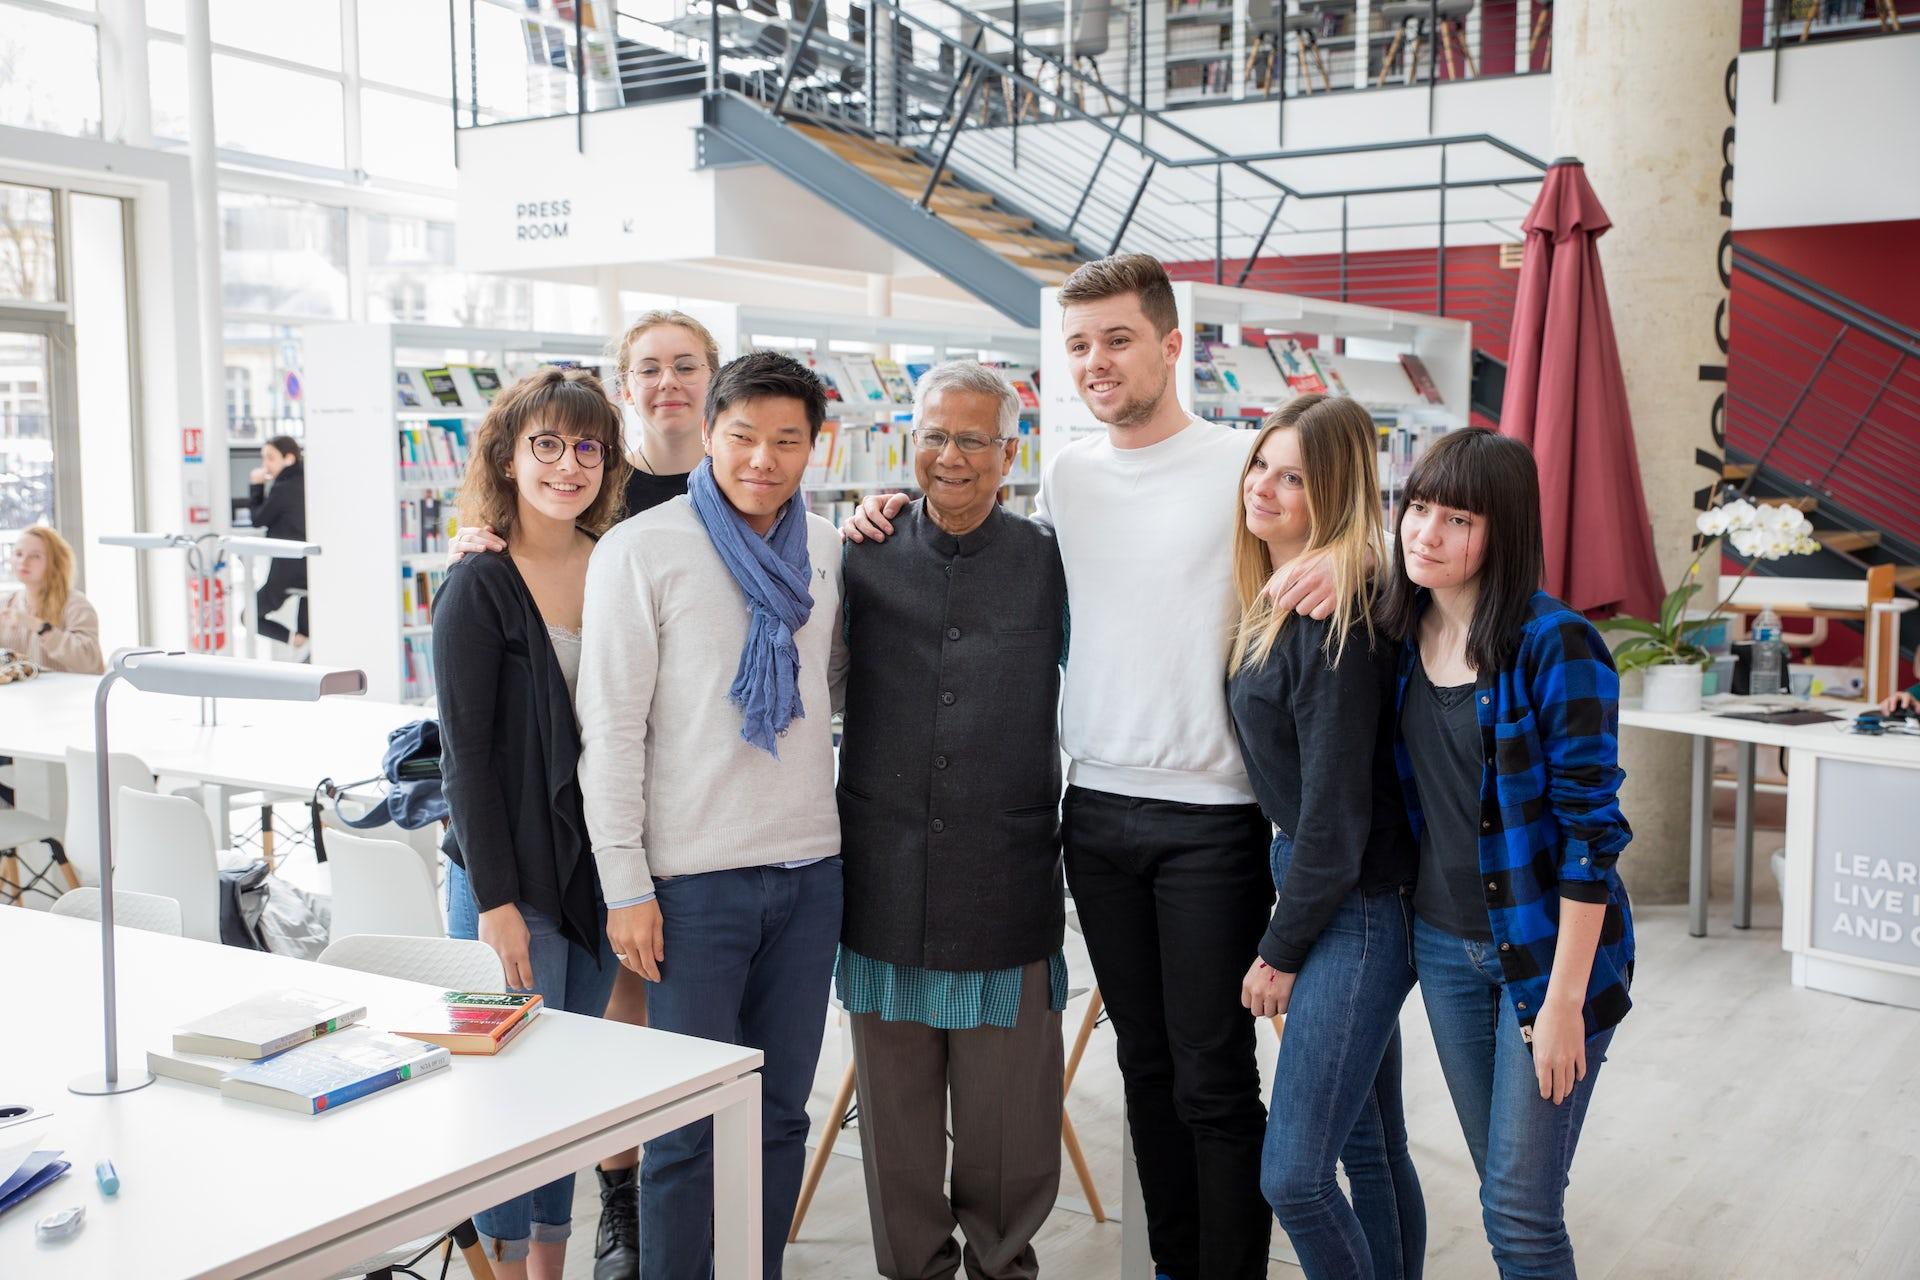 Retour d'expérience : Muhammad Yunus, un leadership inspirant